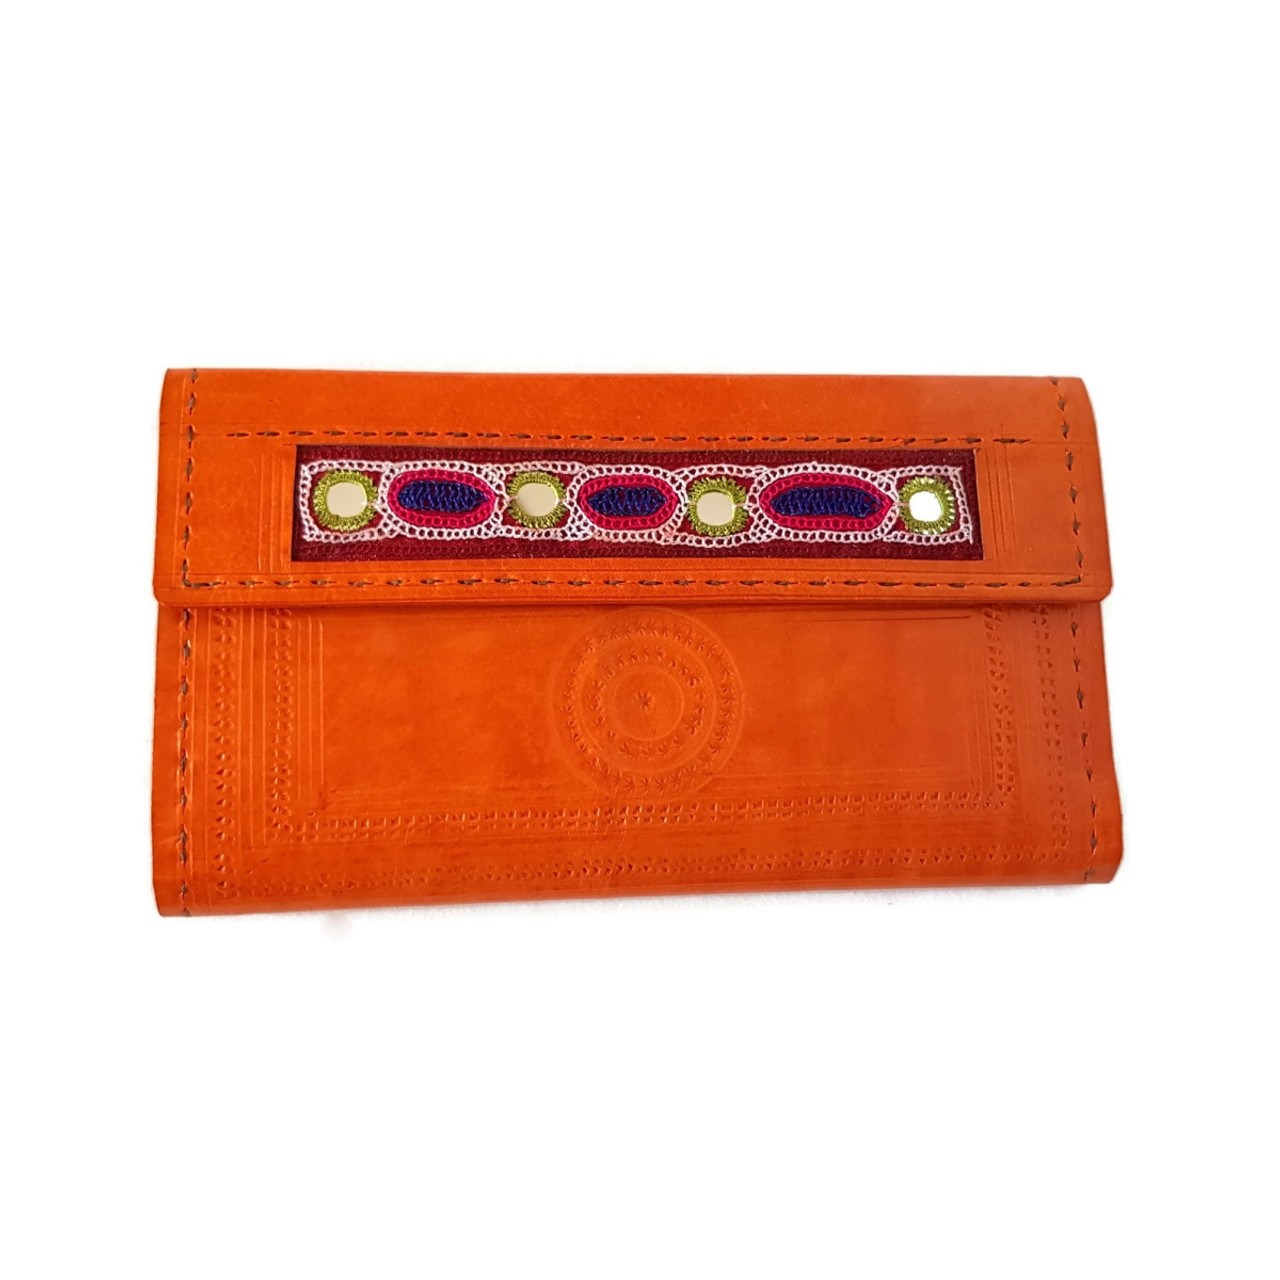 56f42ba94d Leather embroidered wallet Orange - Tarini